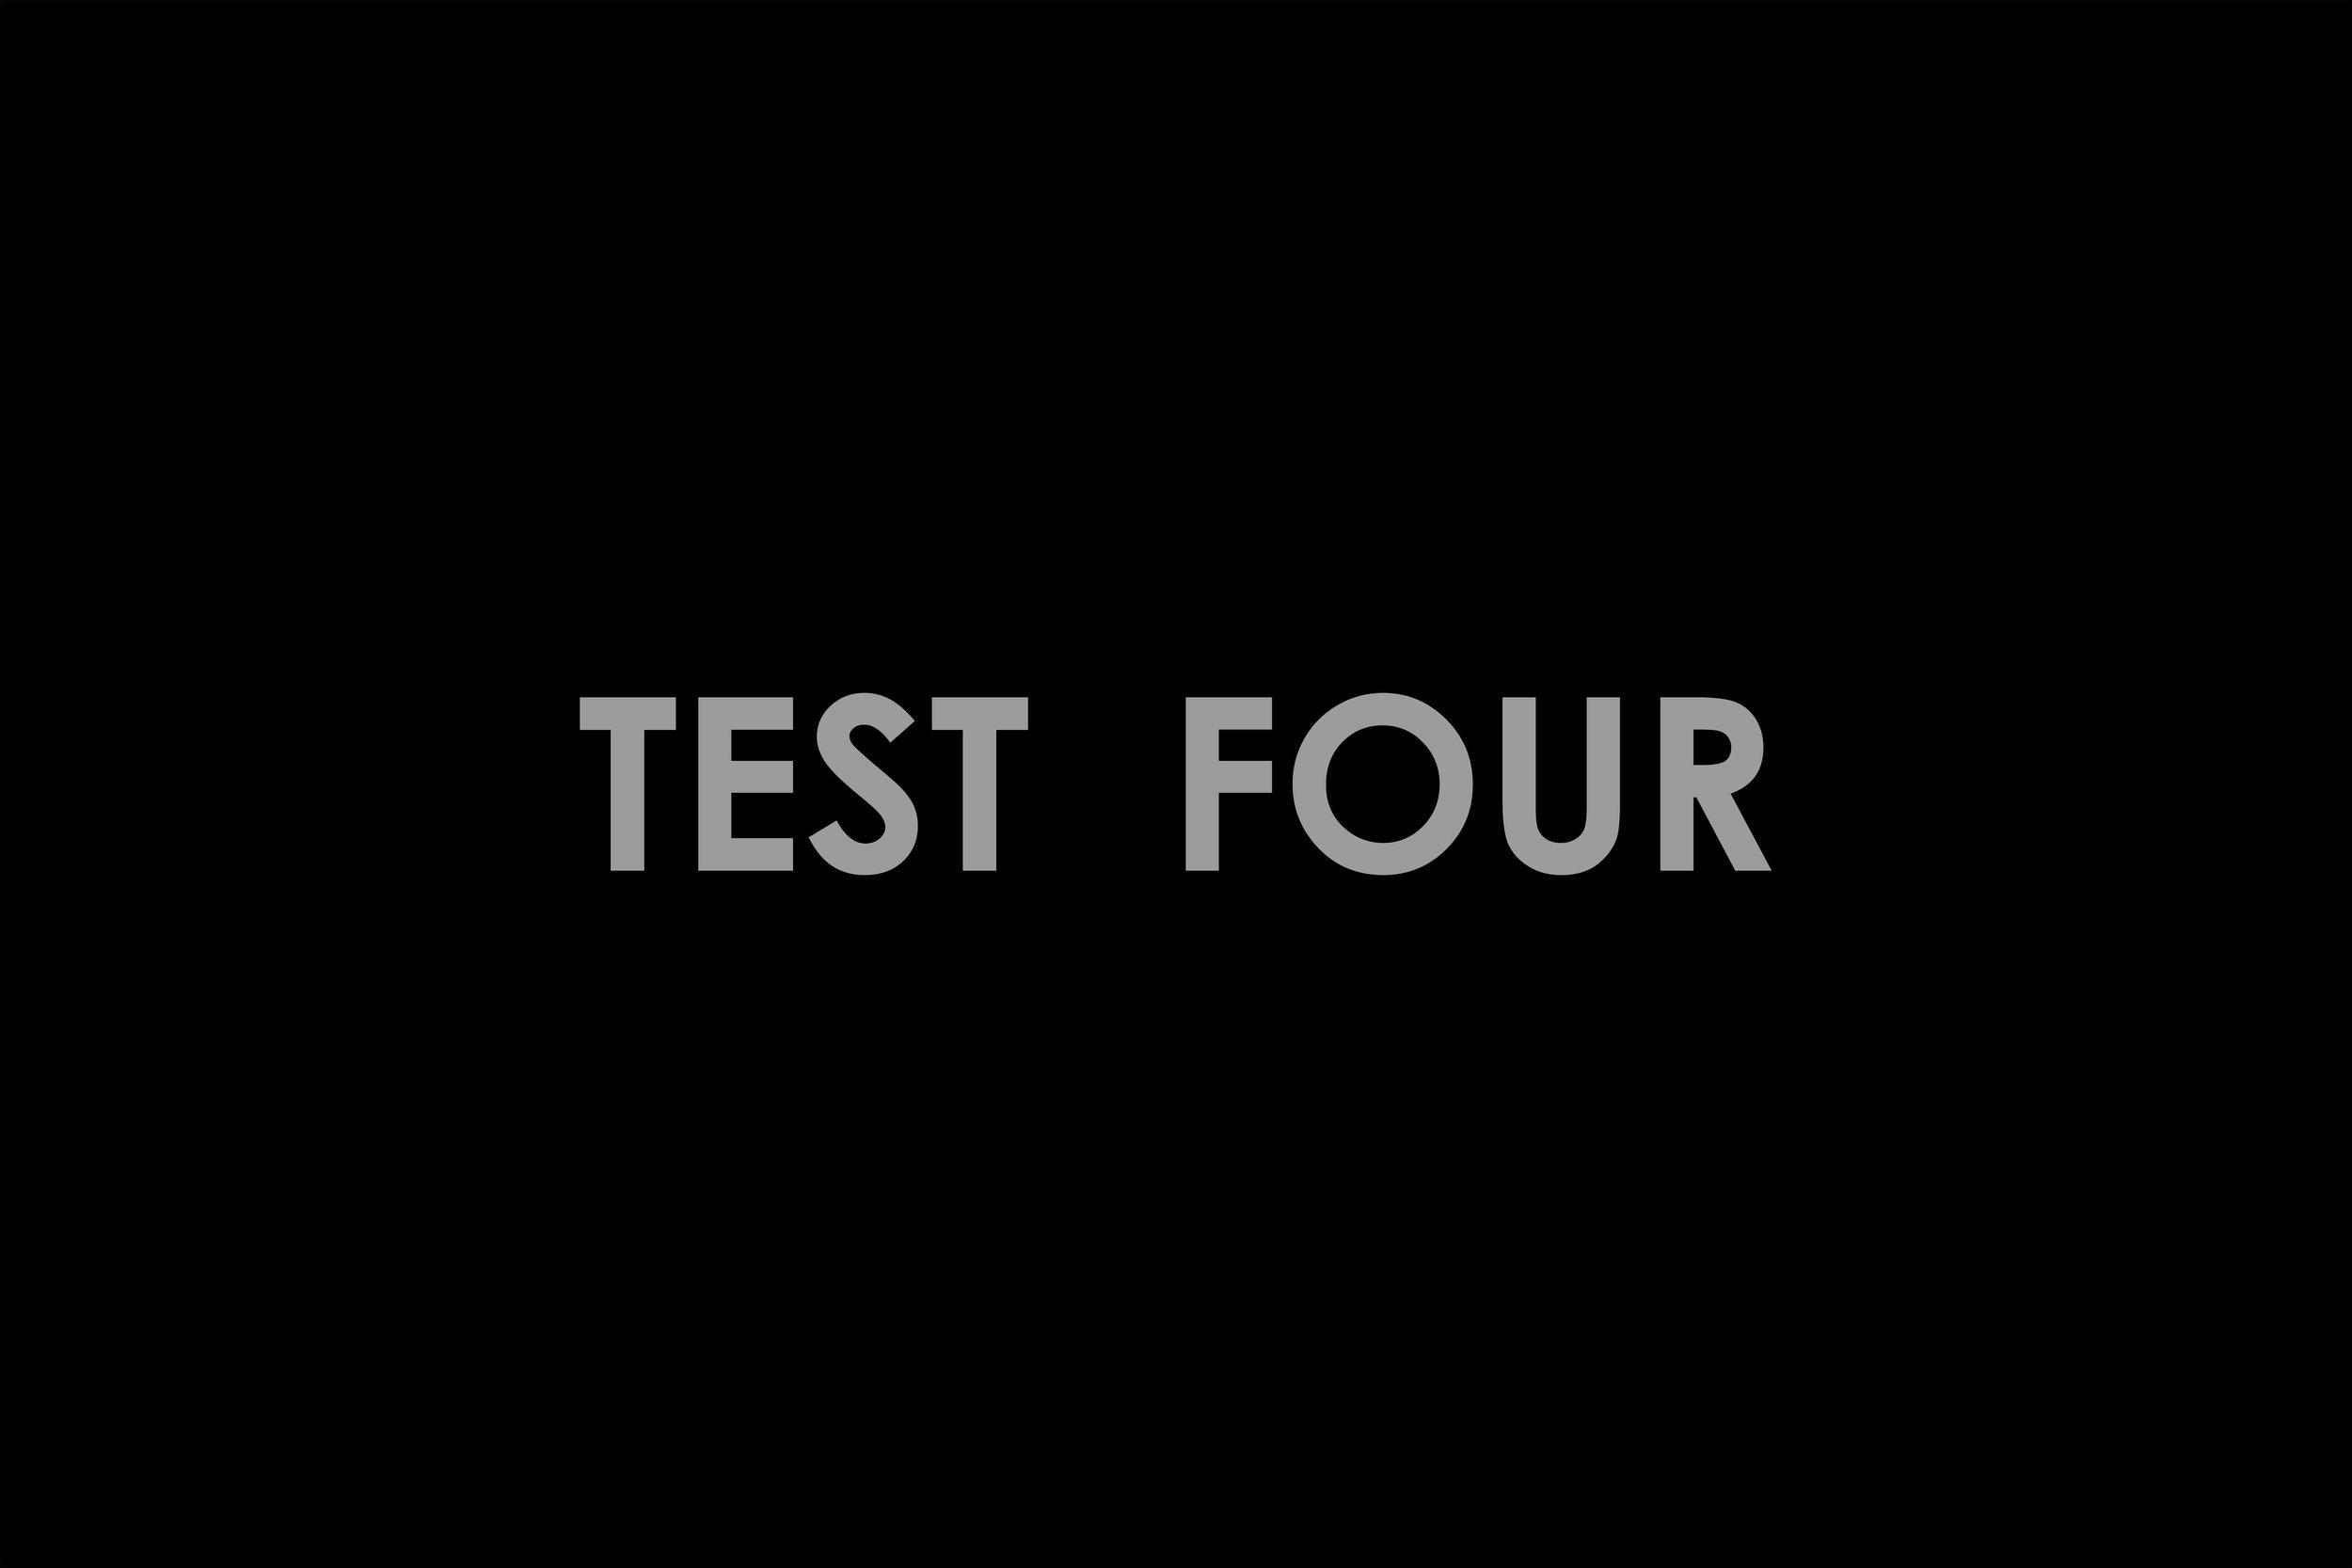 TEST FOUR.jpg